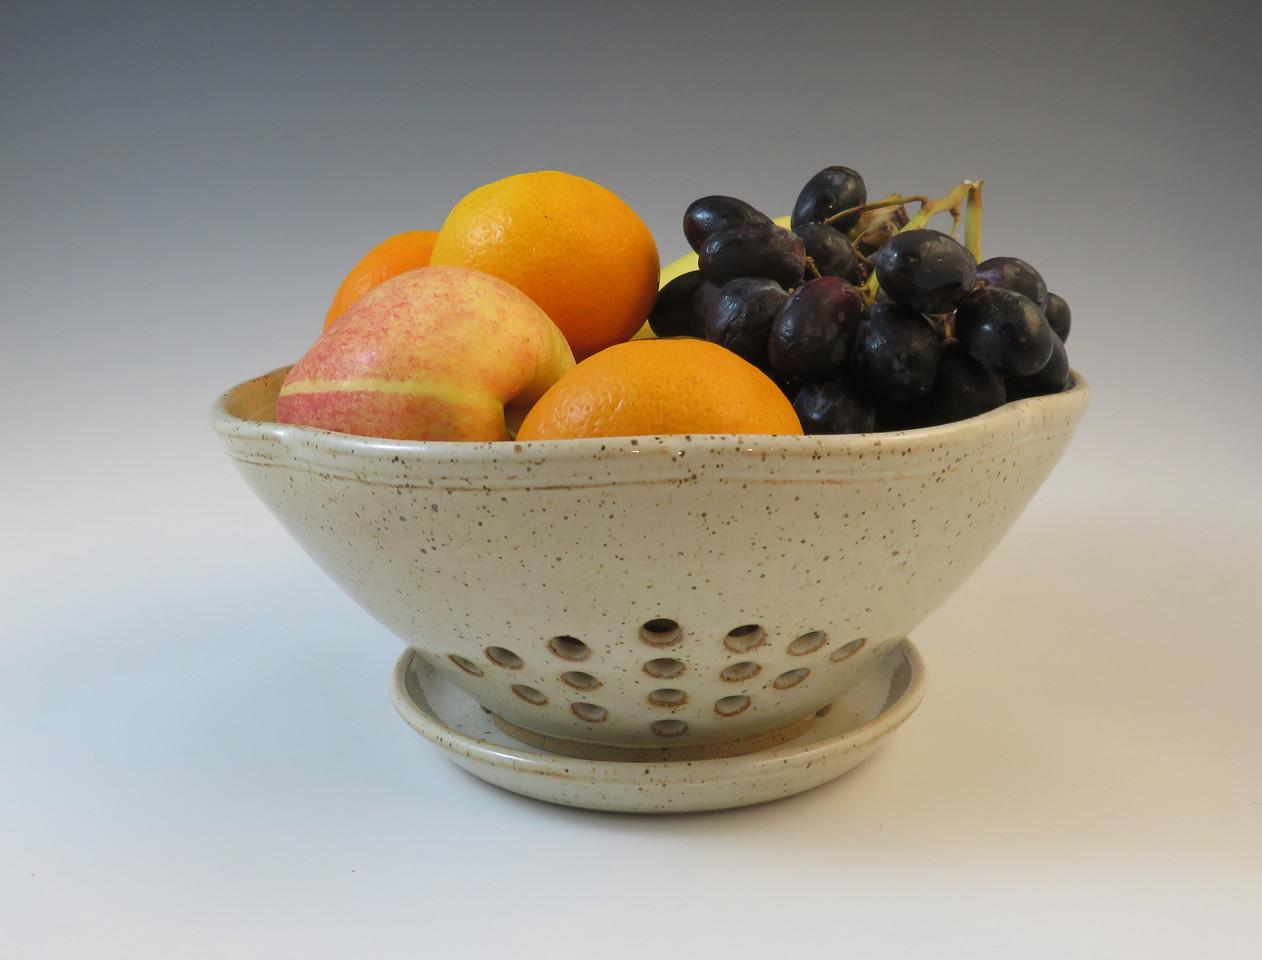 Fruit Bowl in Vanilla Spice